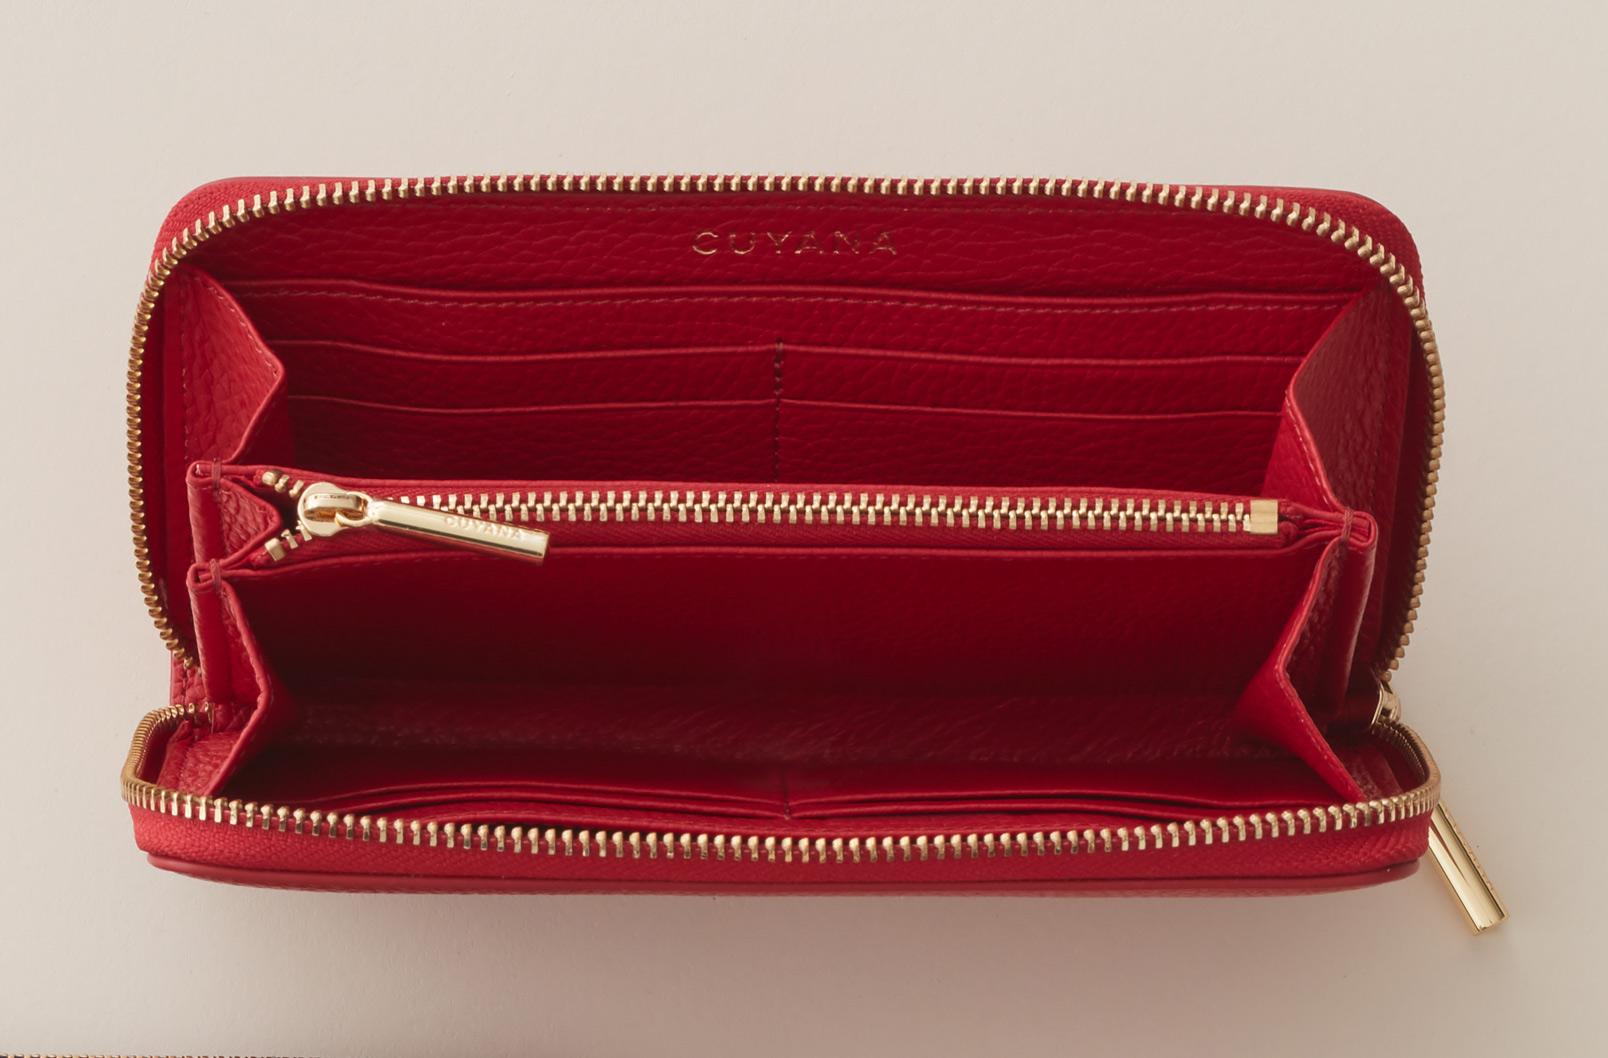 Cuyana Classic Zip Around Wallet interior image